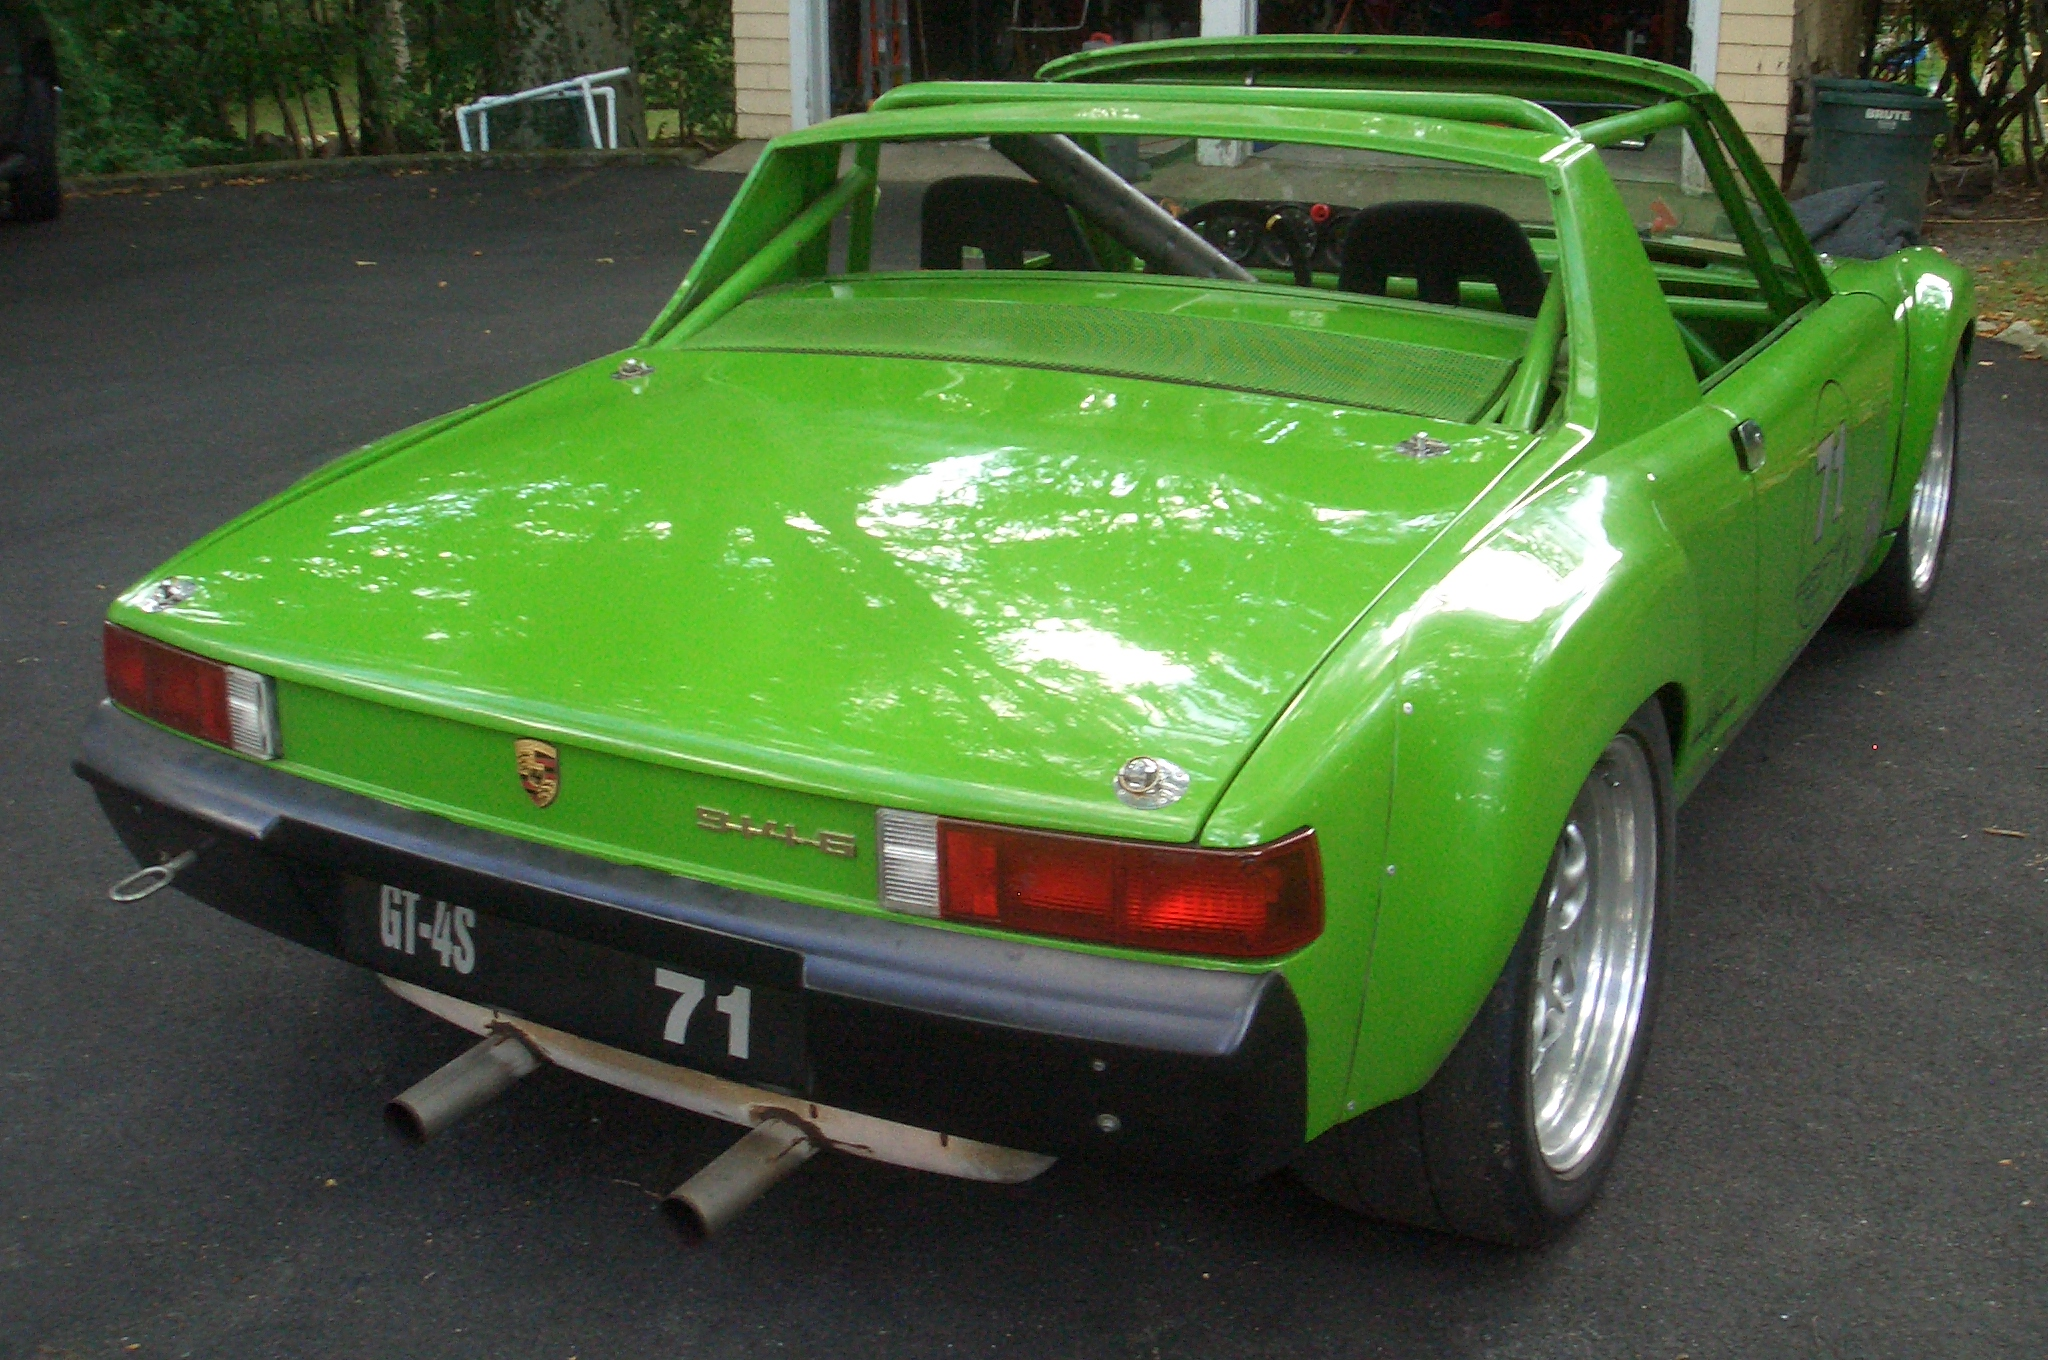 Porsche 914-6 Club Racer